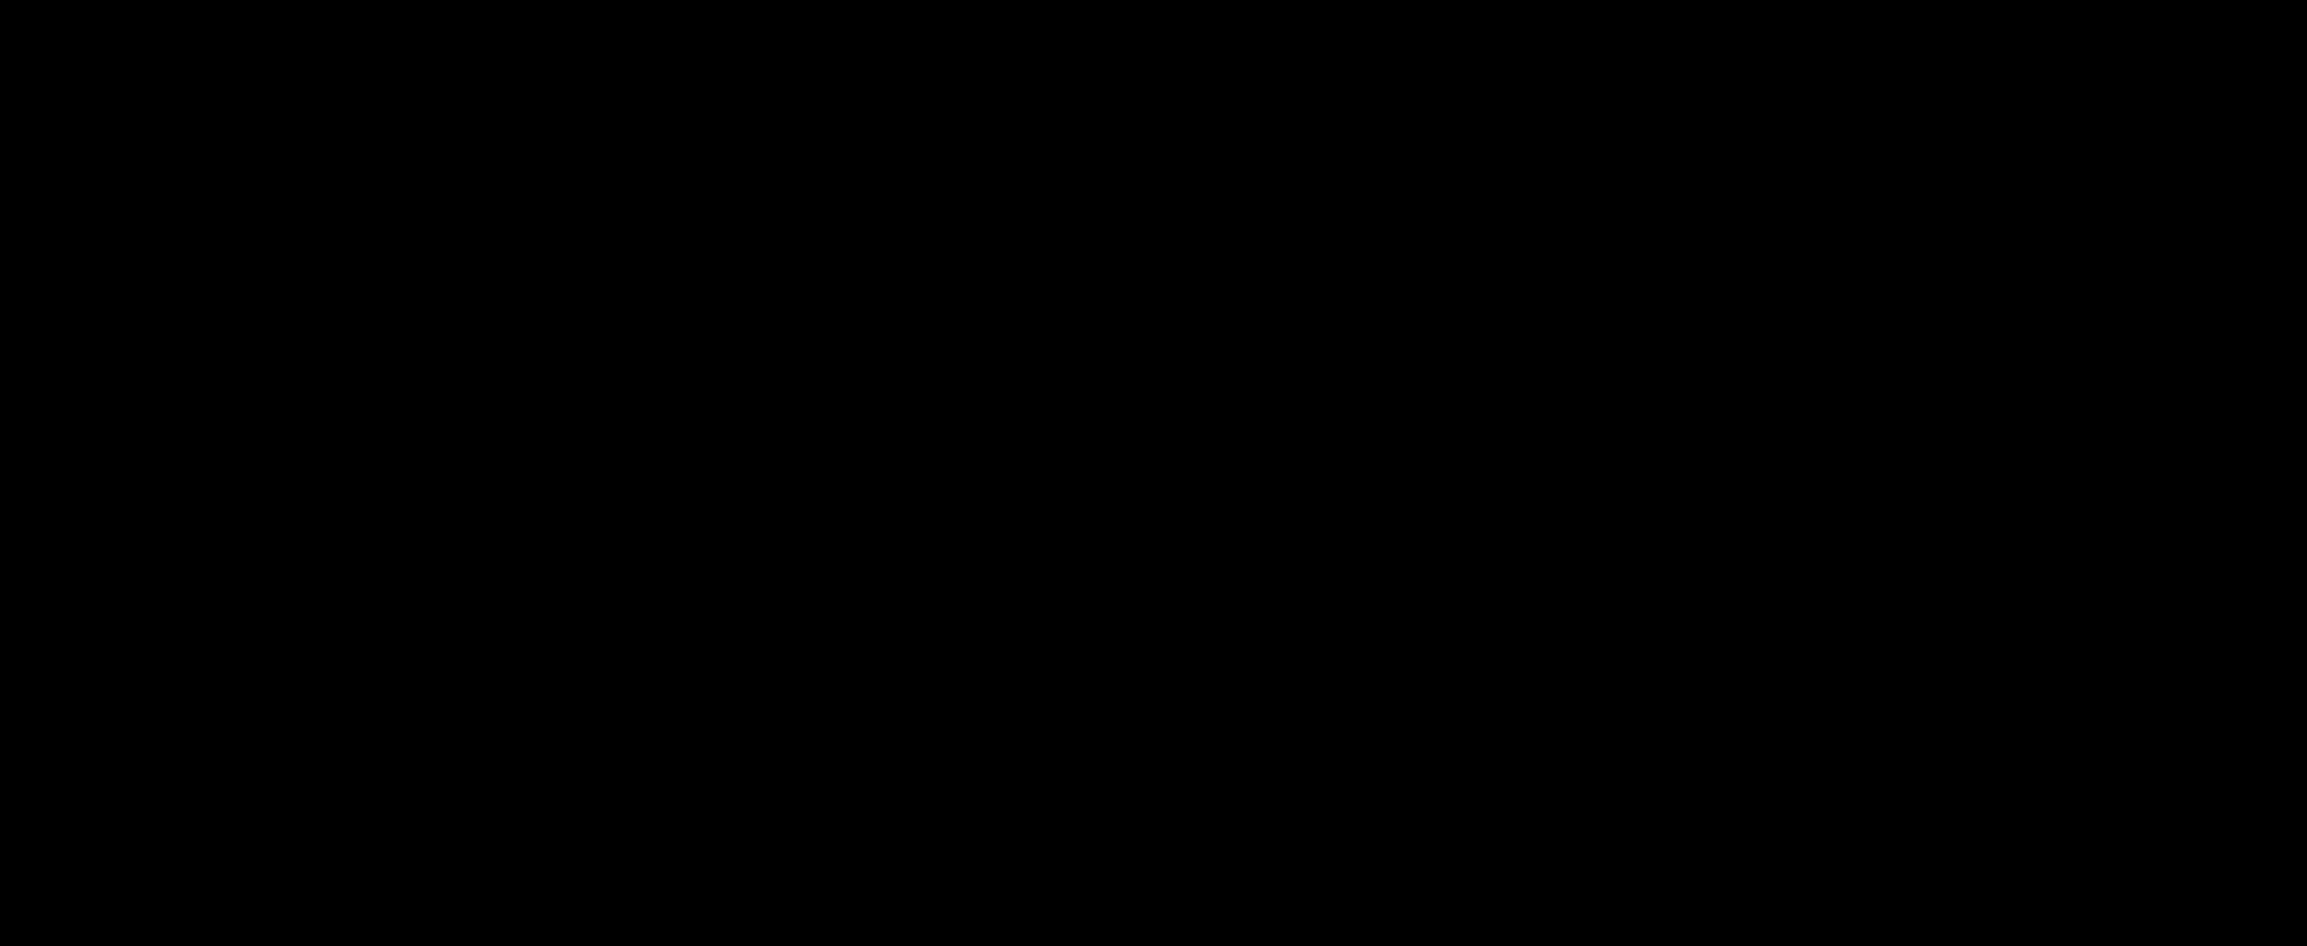 Knoevenagel condensation — ChemTube3D